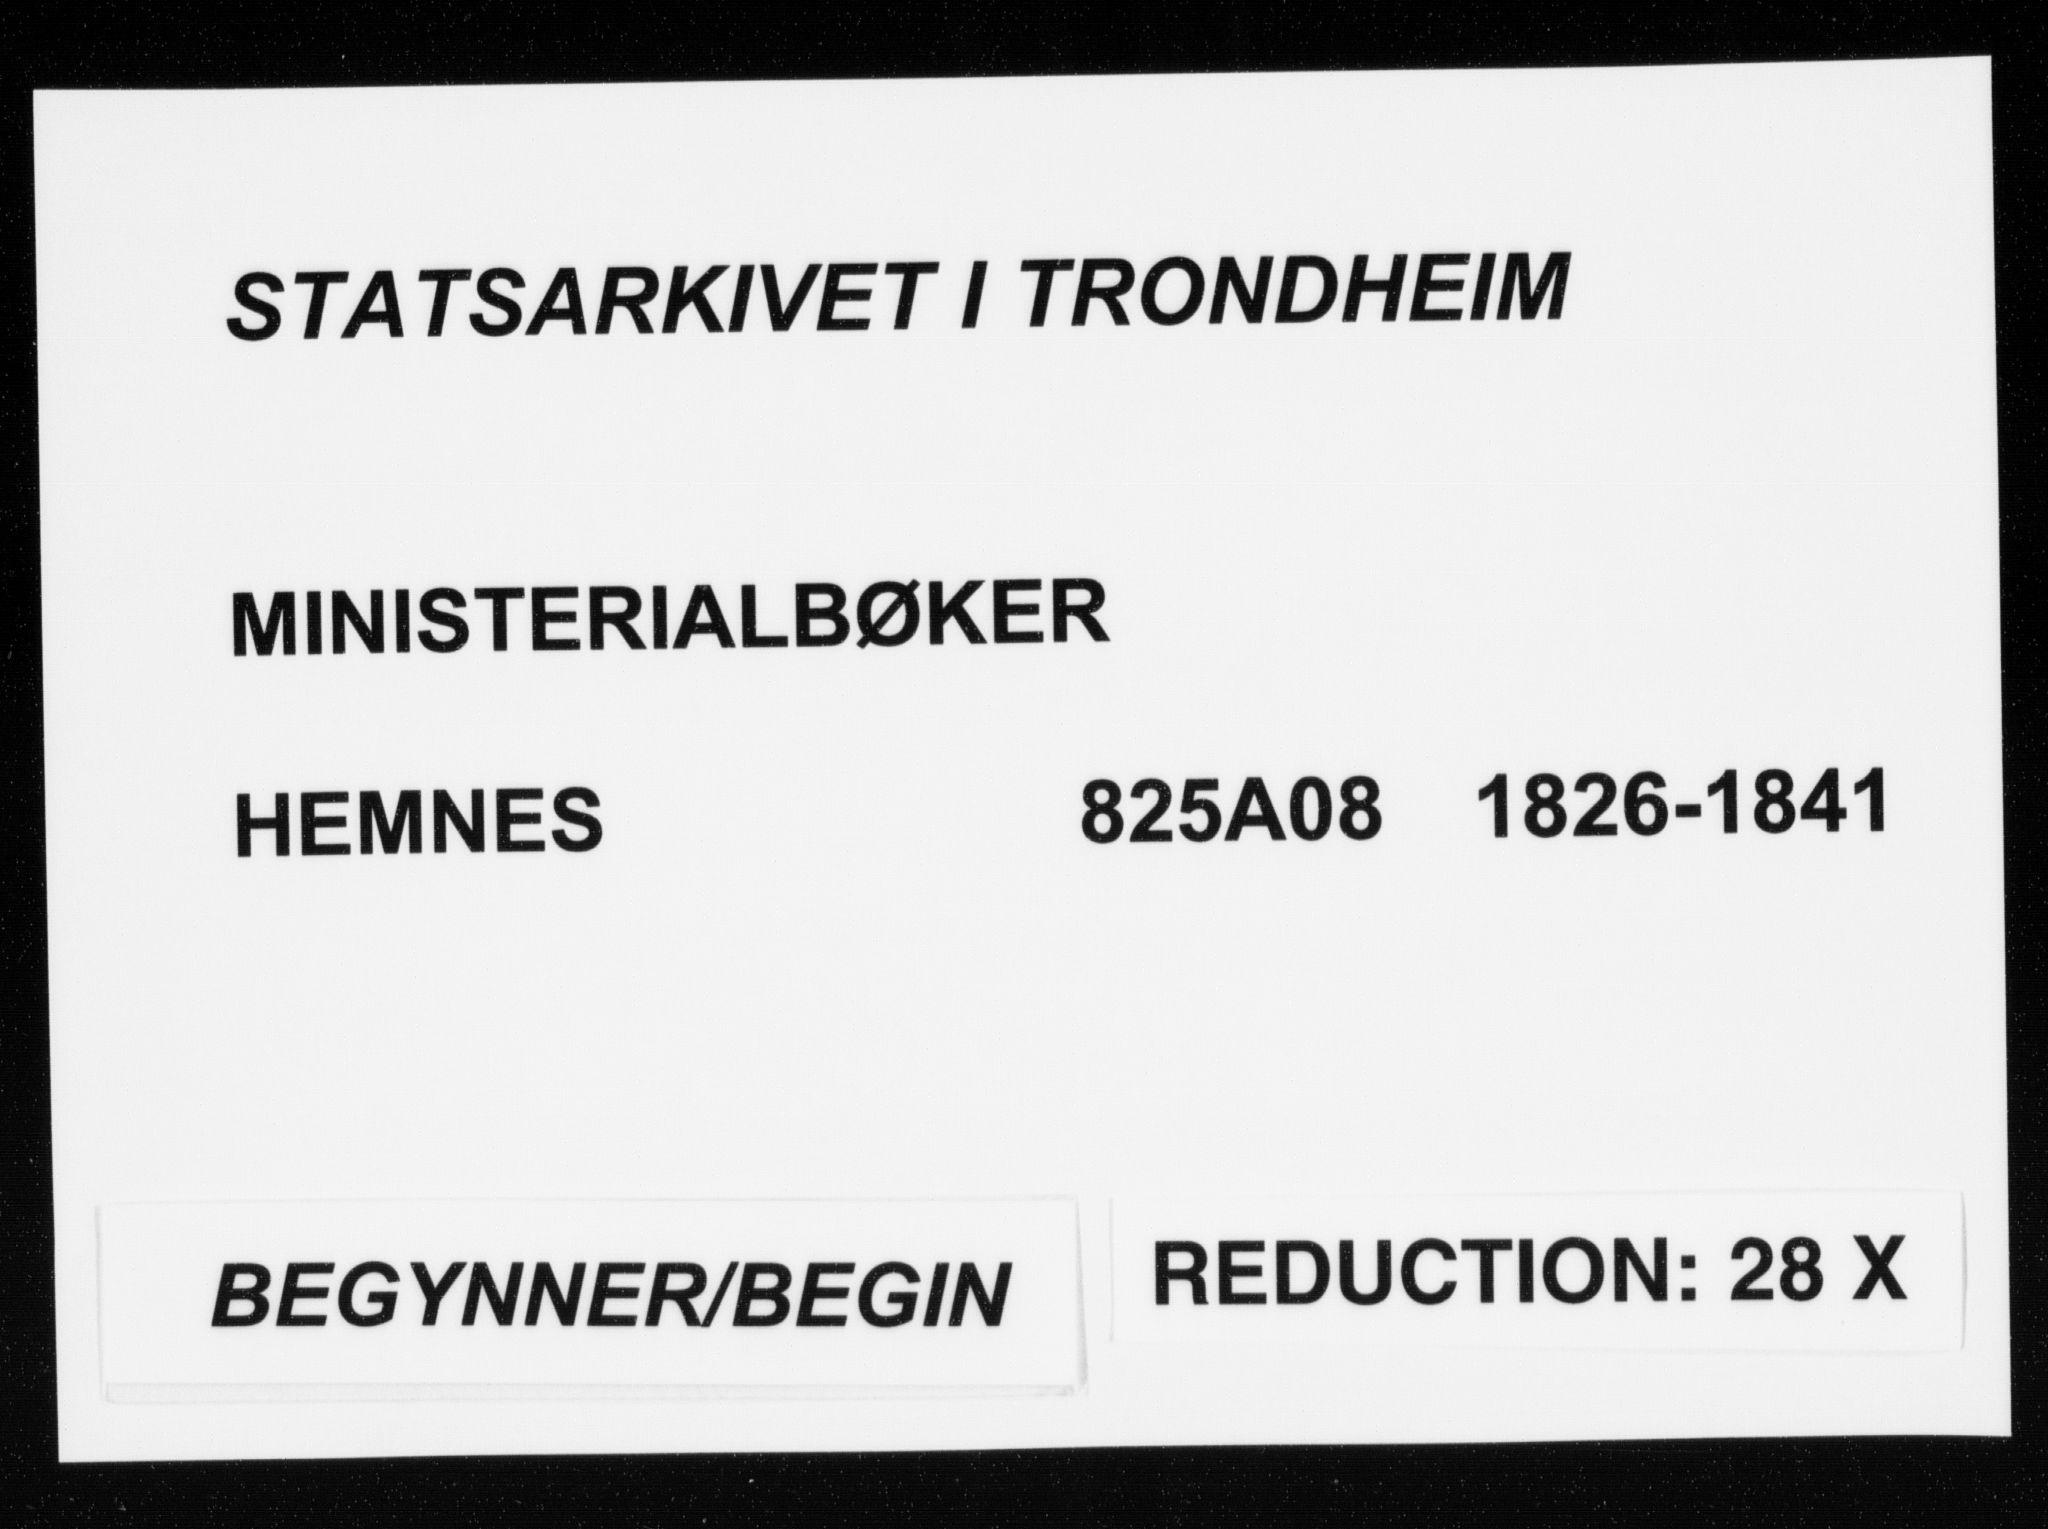 SAT, Ministerialprotokoller, klokkerbøker og fødselsregistre - Nordland, 825/L0354: Ministerialbok nr. 825A08, 1826-1841